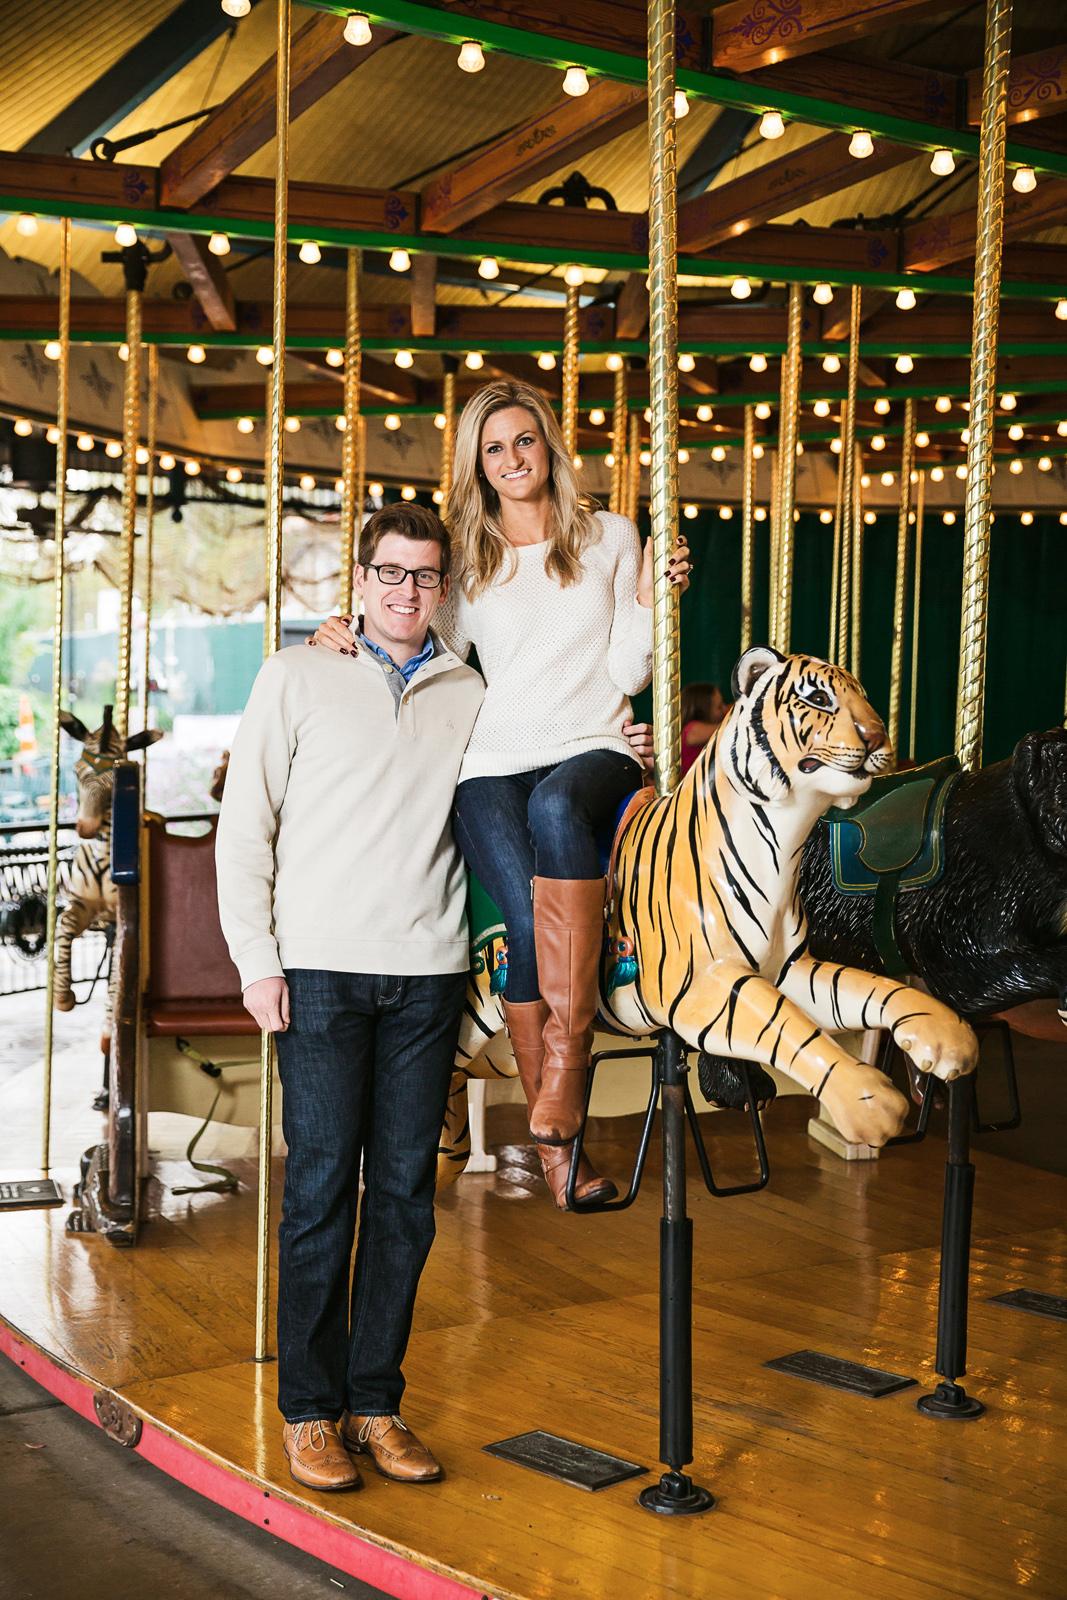 Oldani-Photography-St-Louis-Forest-Park-Zoo-Carousel-Engagement-Photos.jpg